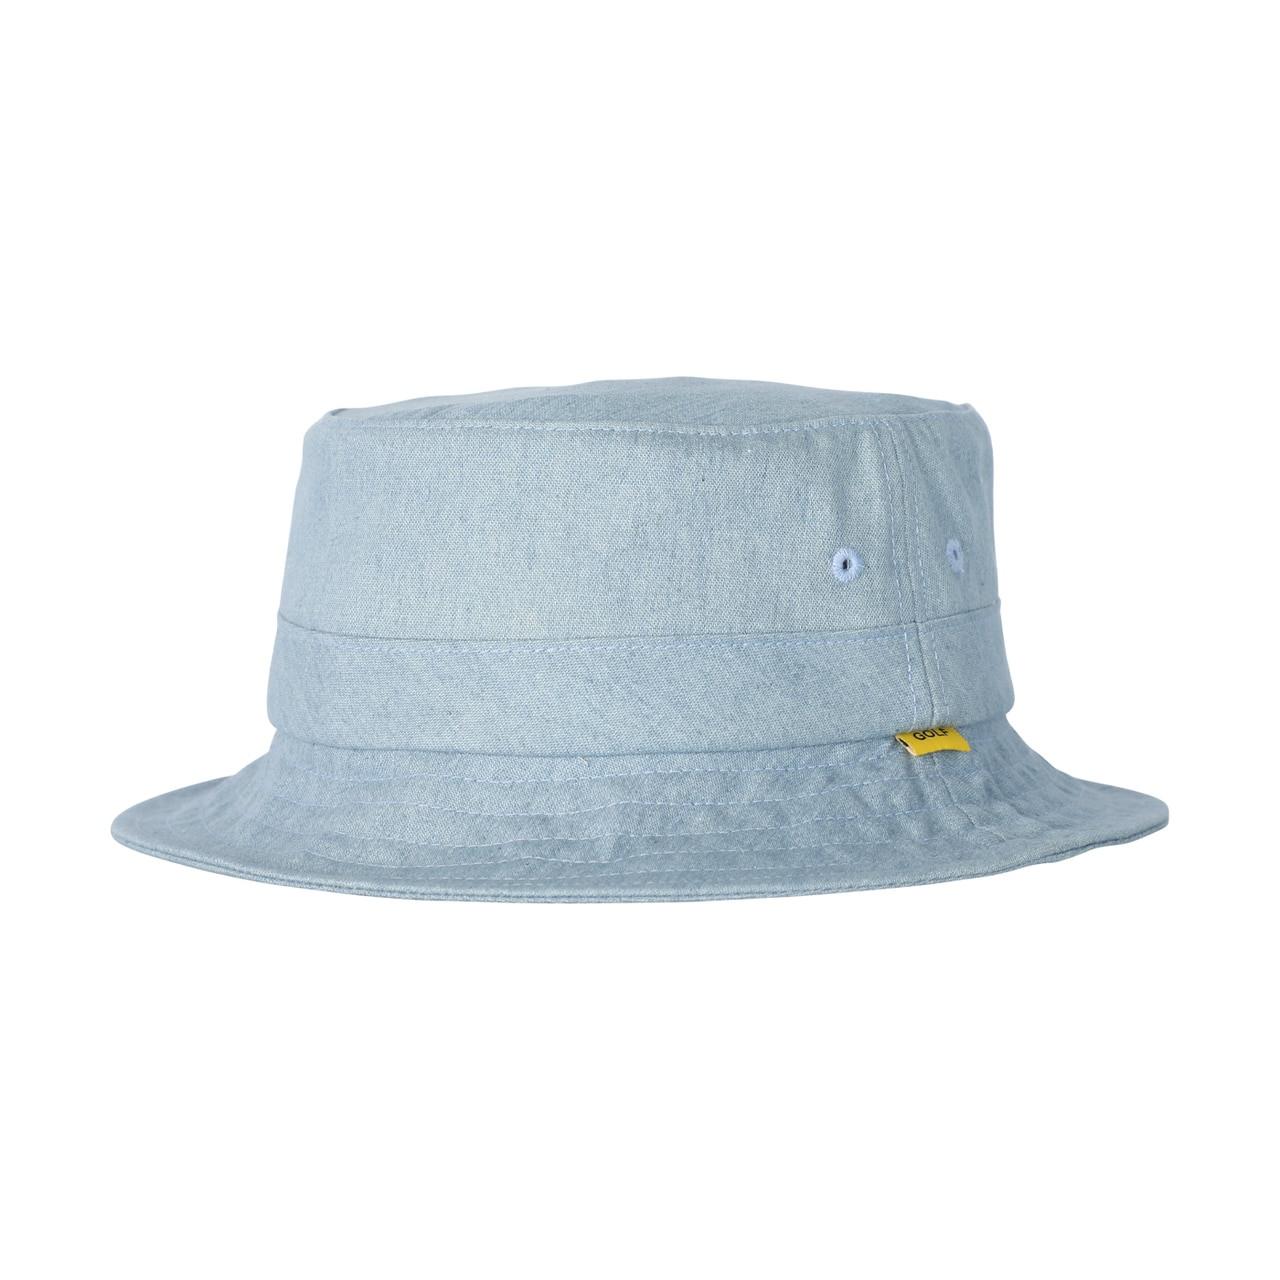 SOLID BUCKET HAT - LIGHT DENIM by GOLF WANG - GOLF WANG 6c8ff6e6aaf